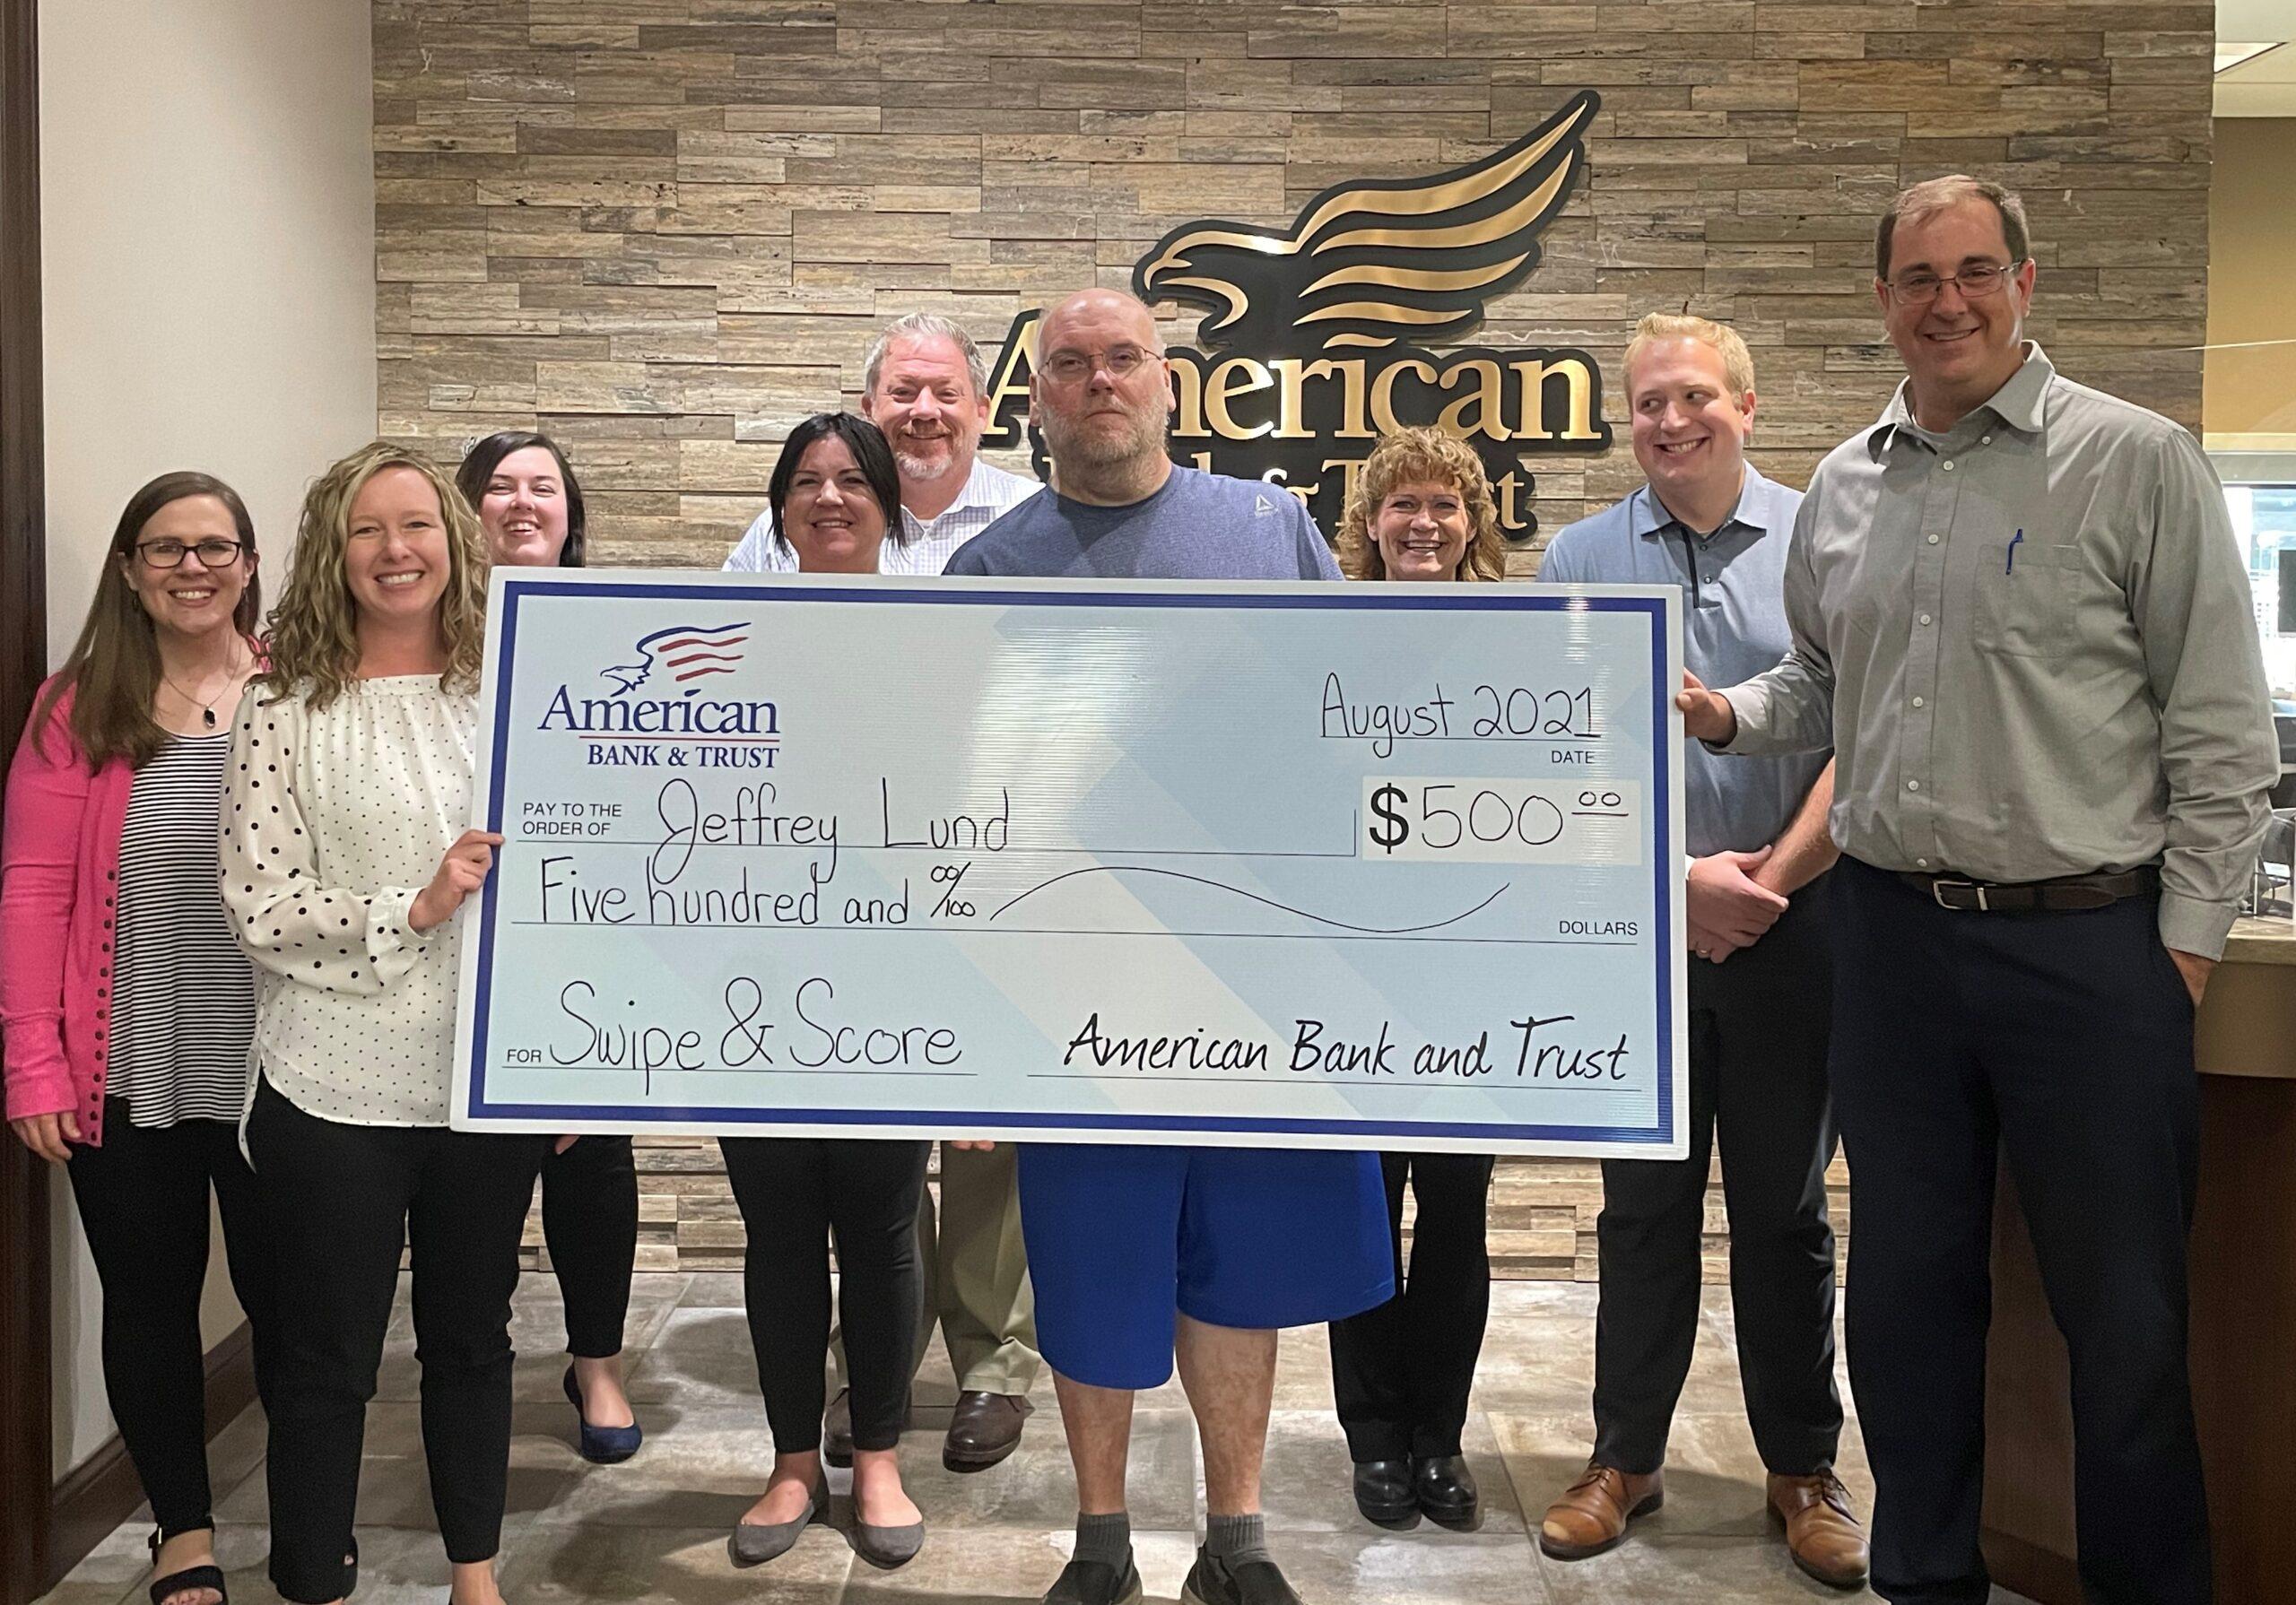 Jeff Lund holding $500 check